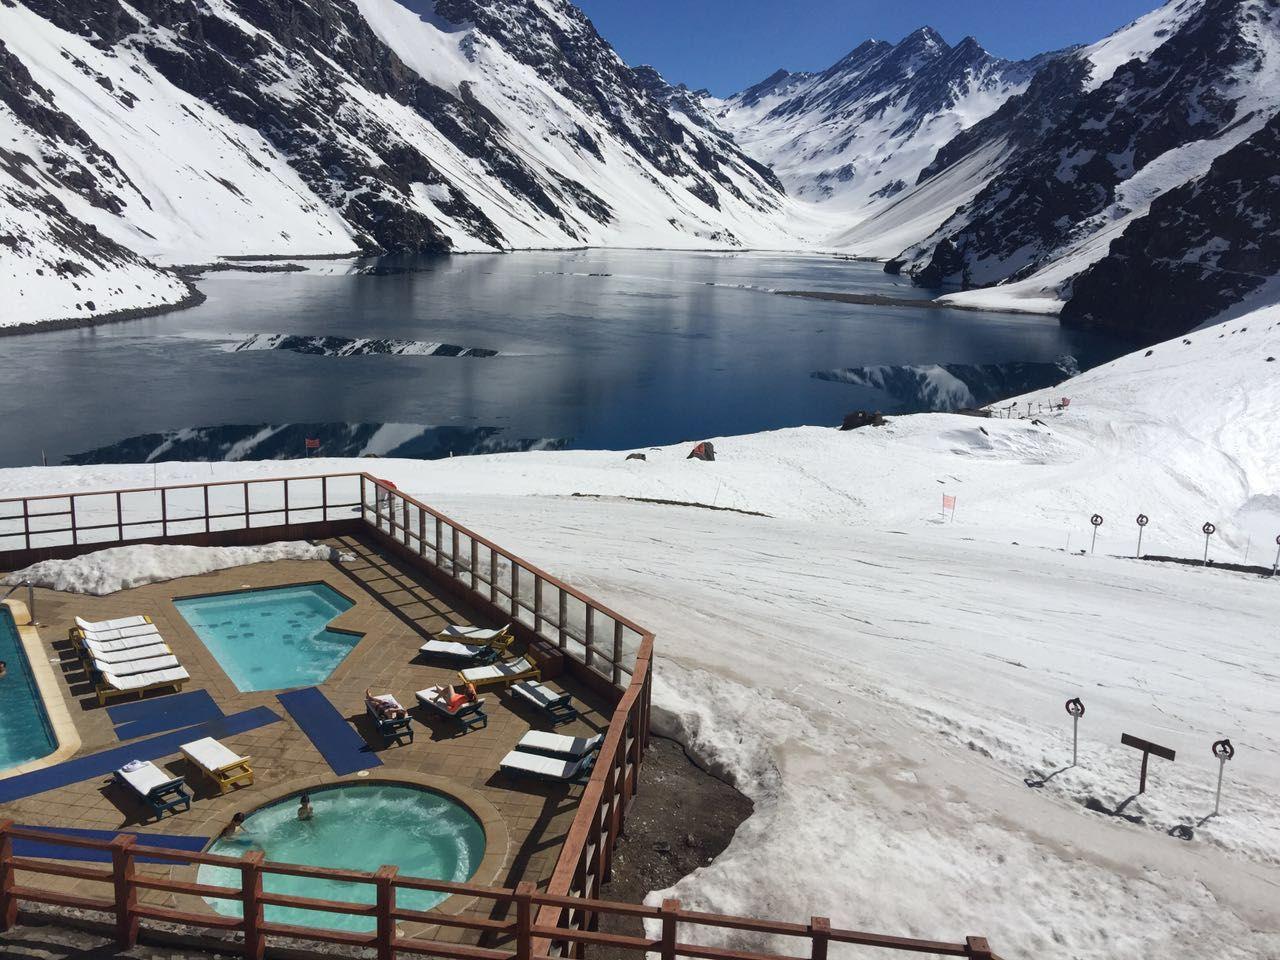 Vale nevado -Chile